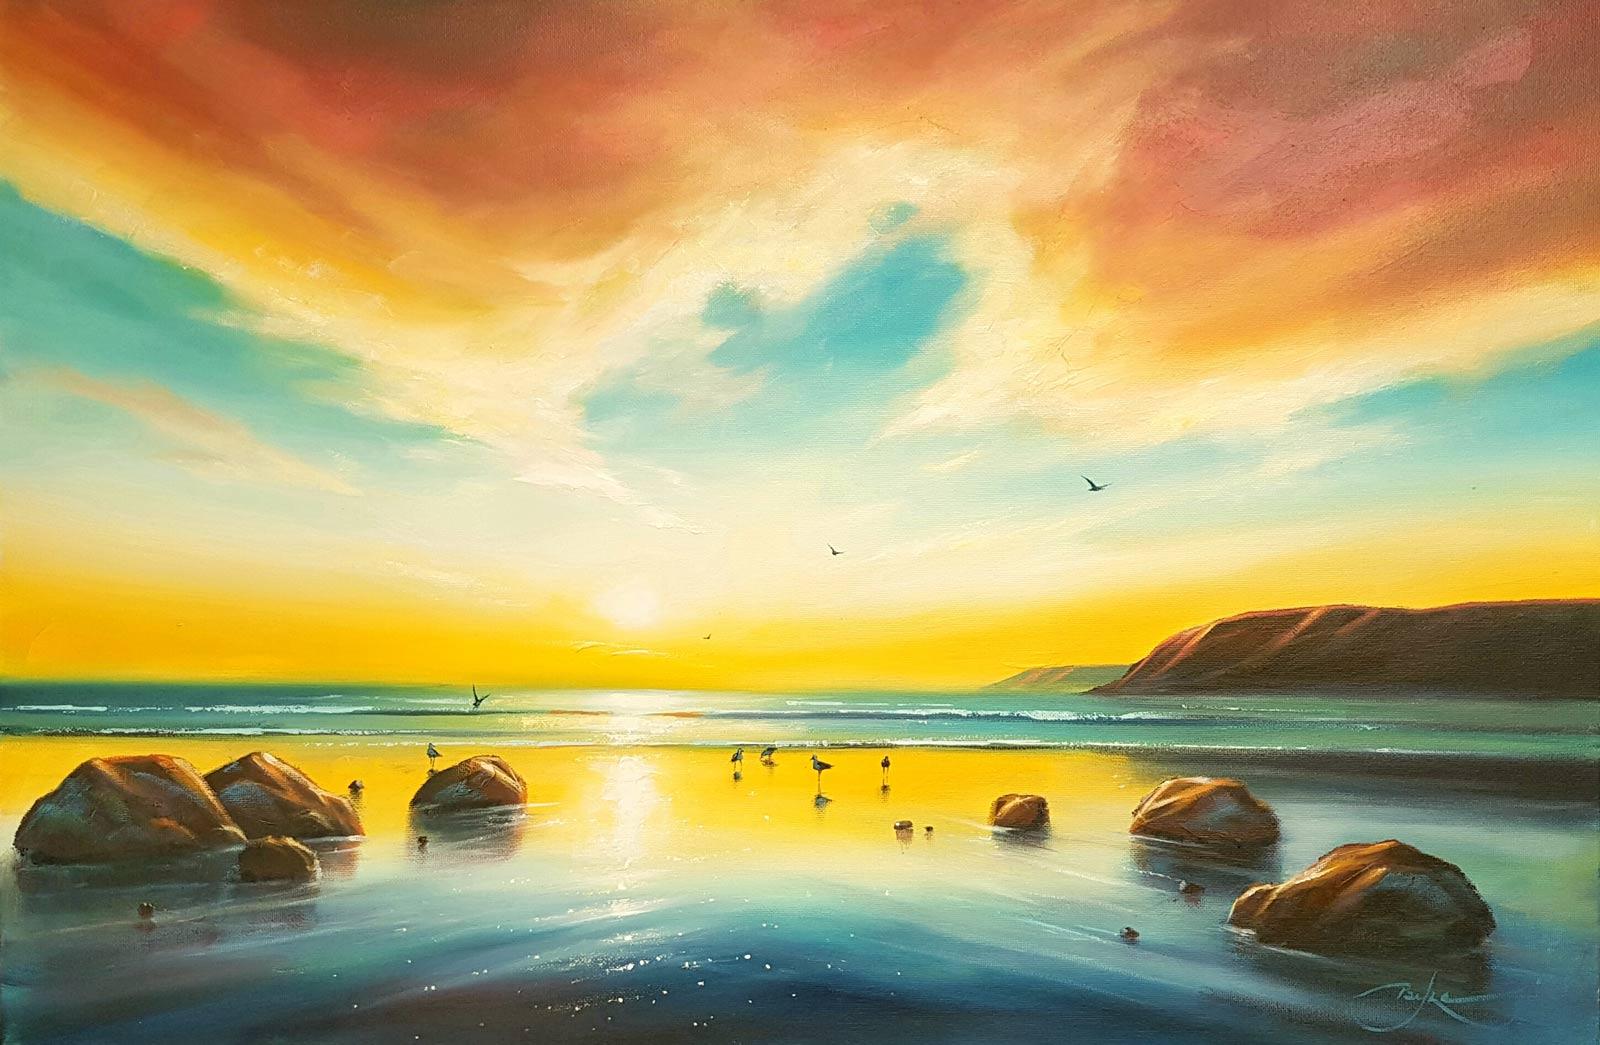 Forest gallery buy original art online for Buy original art online